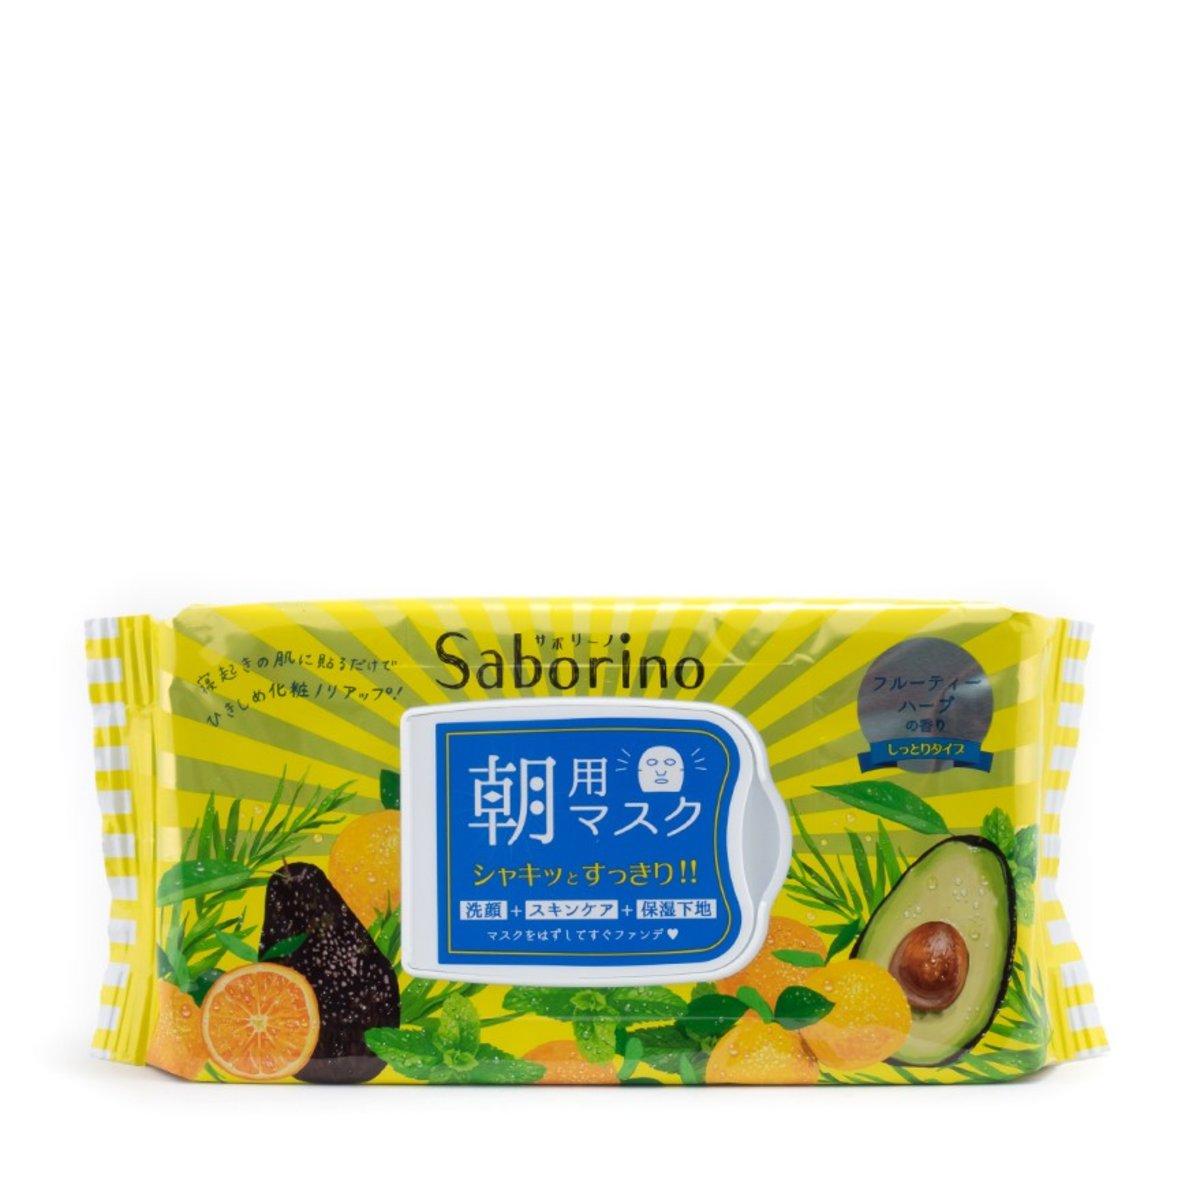 Saborino早安面膜 (32 片)